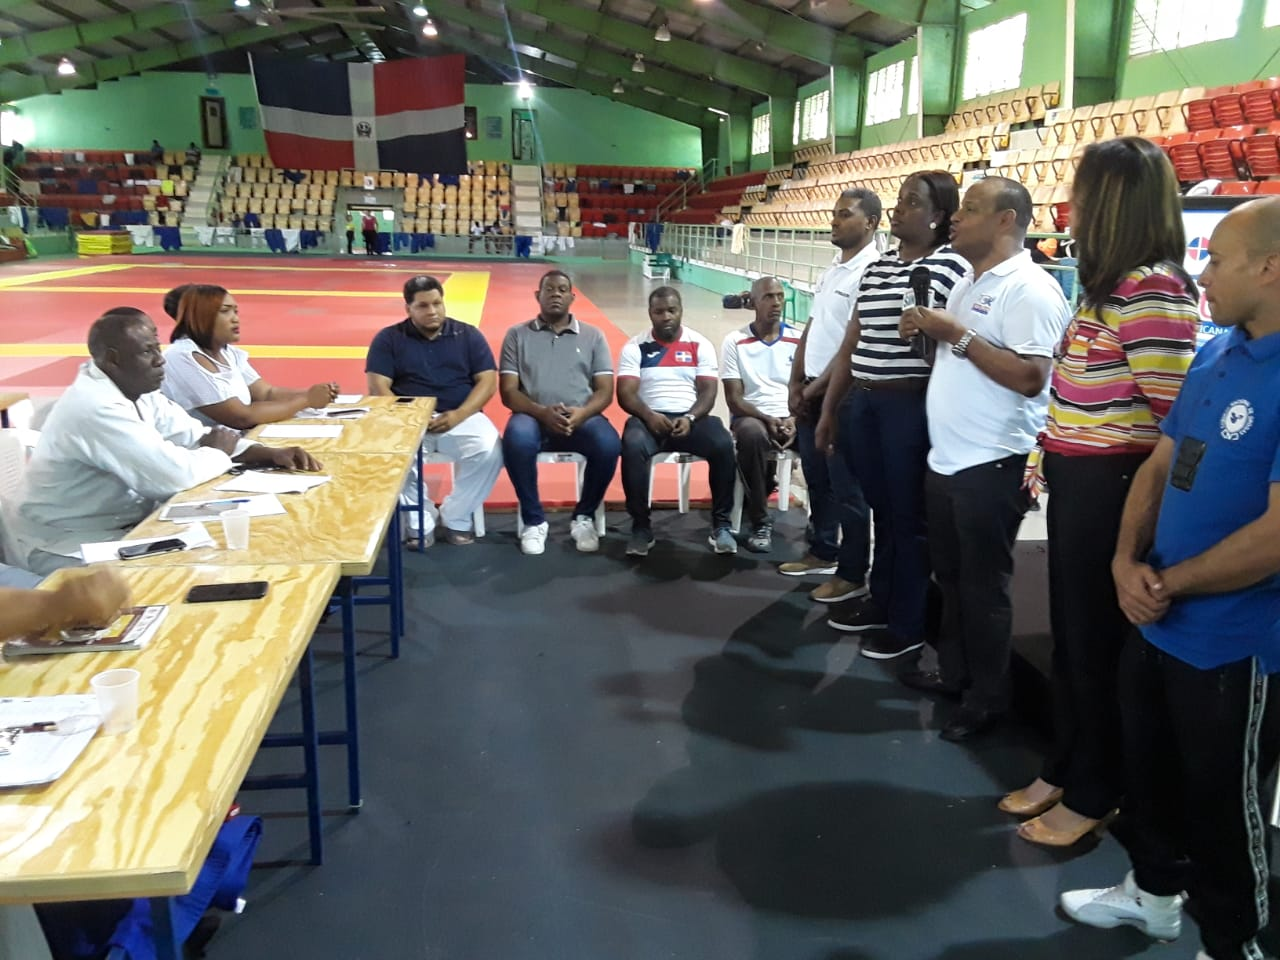 Fedojudo asume como un compromiso formación monitores judo